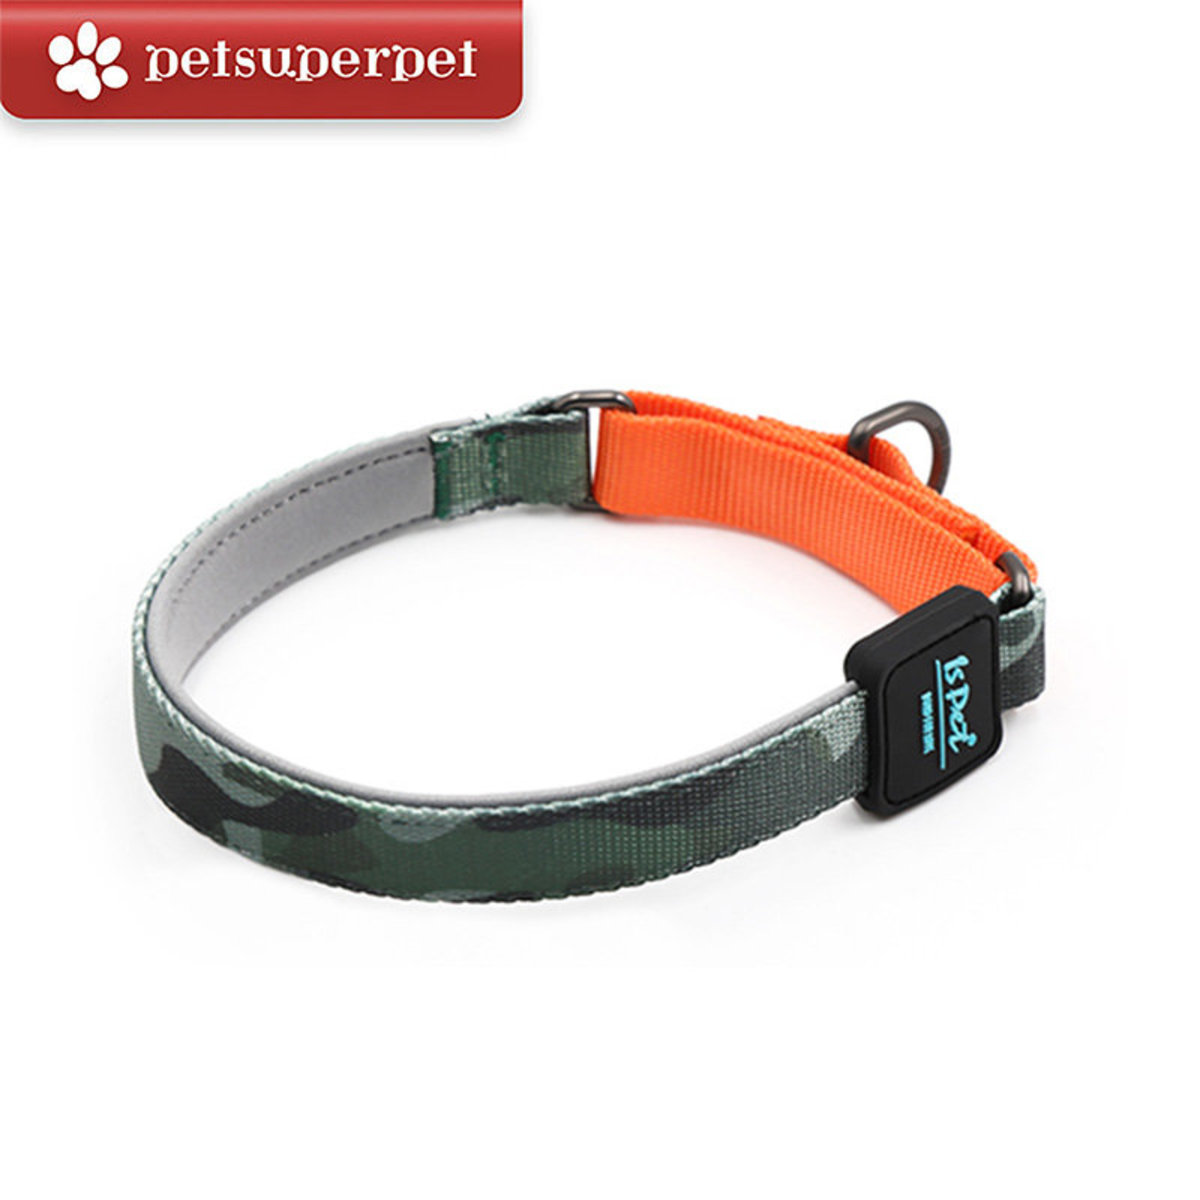 P-Chain Dog Collar - M (Army Green)